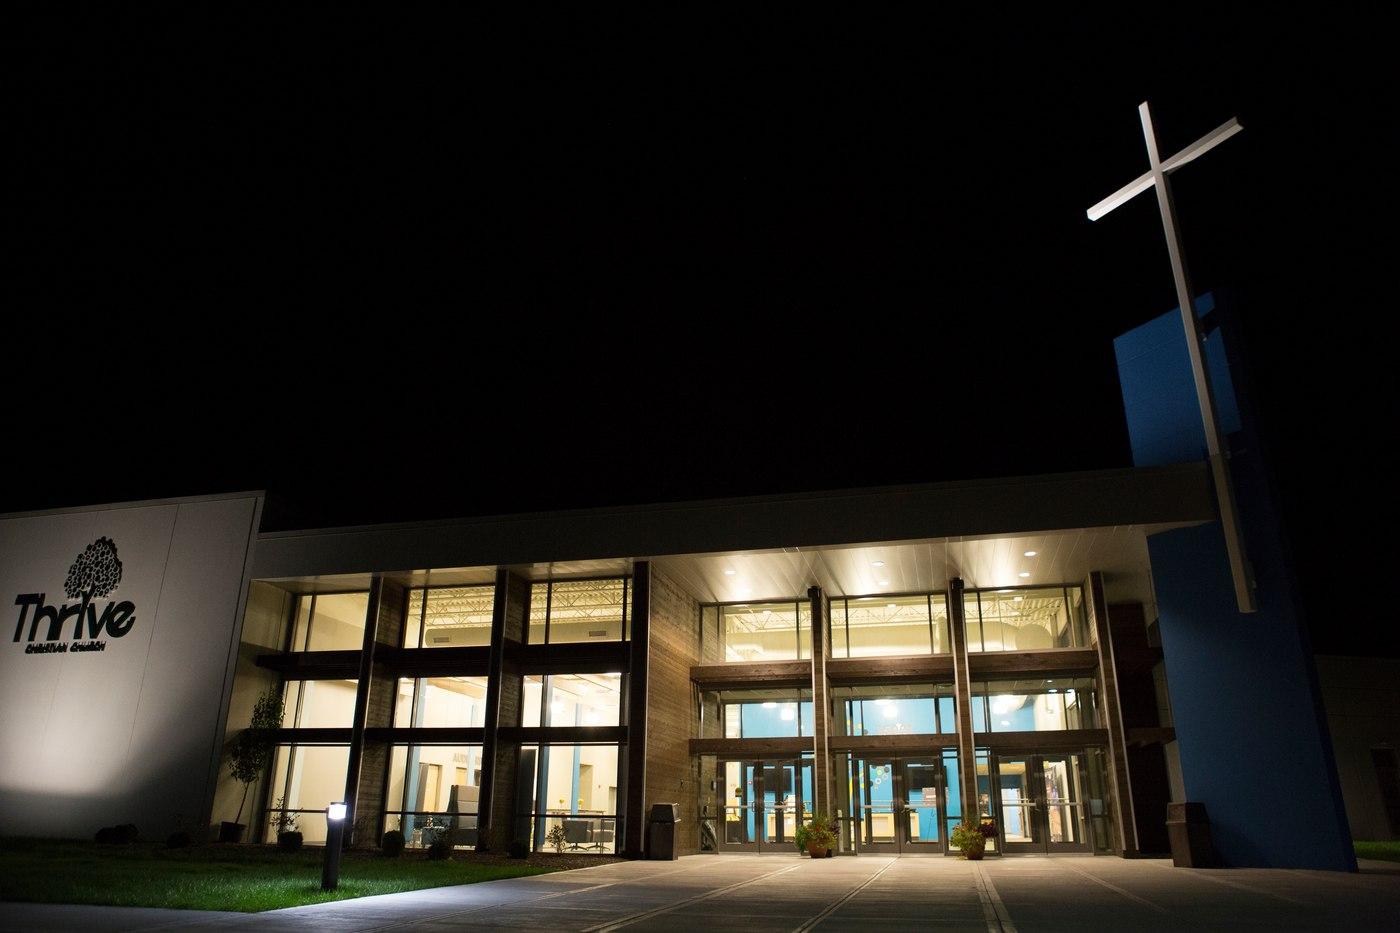 thrive-christian-church-project-portfolio-37 (1).jpg